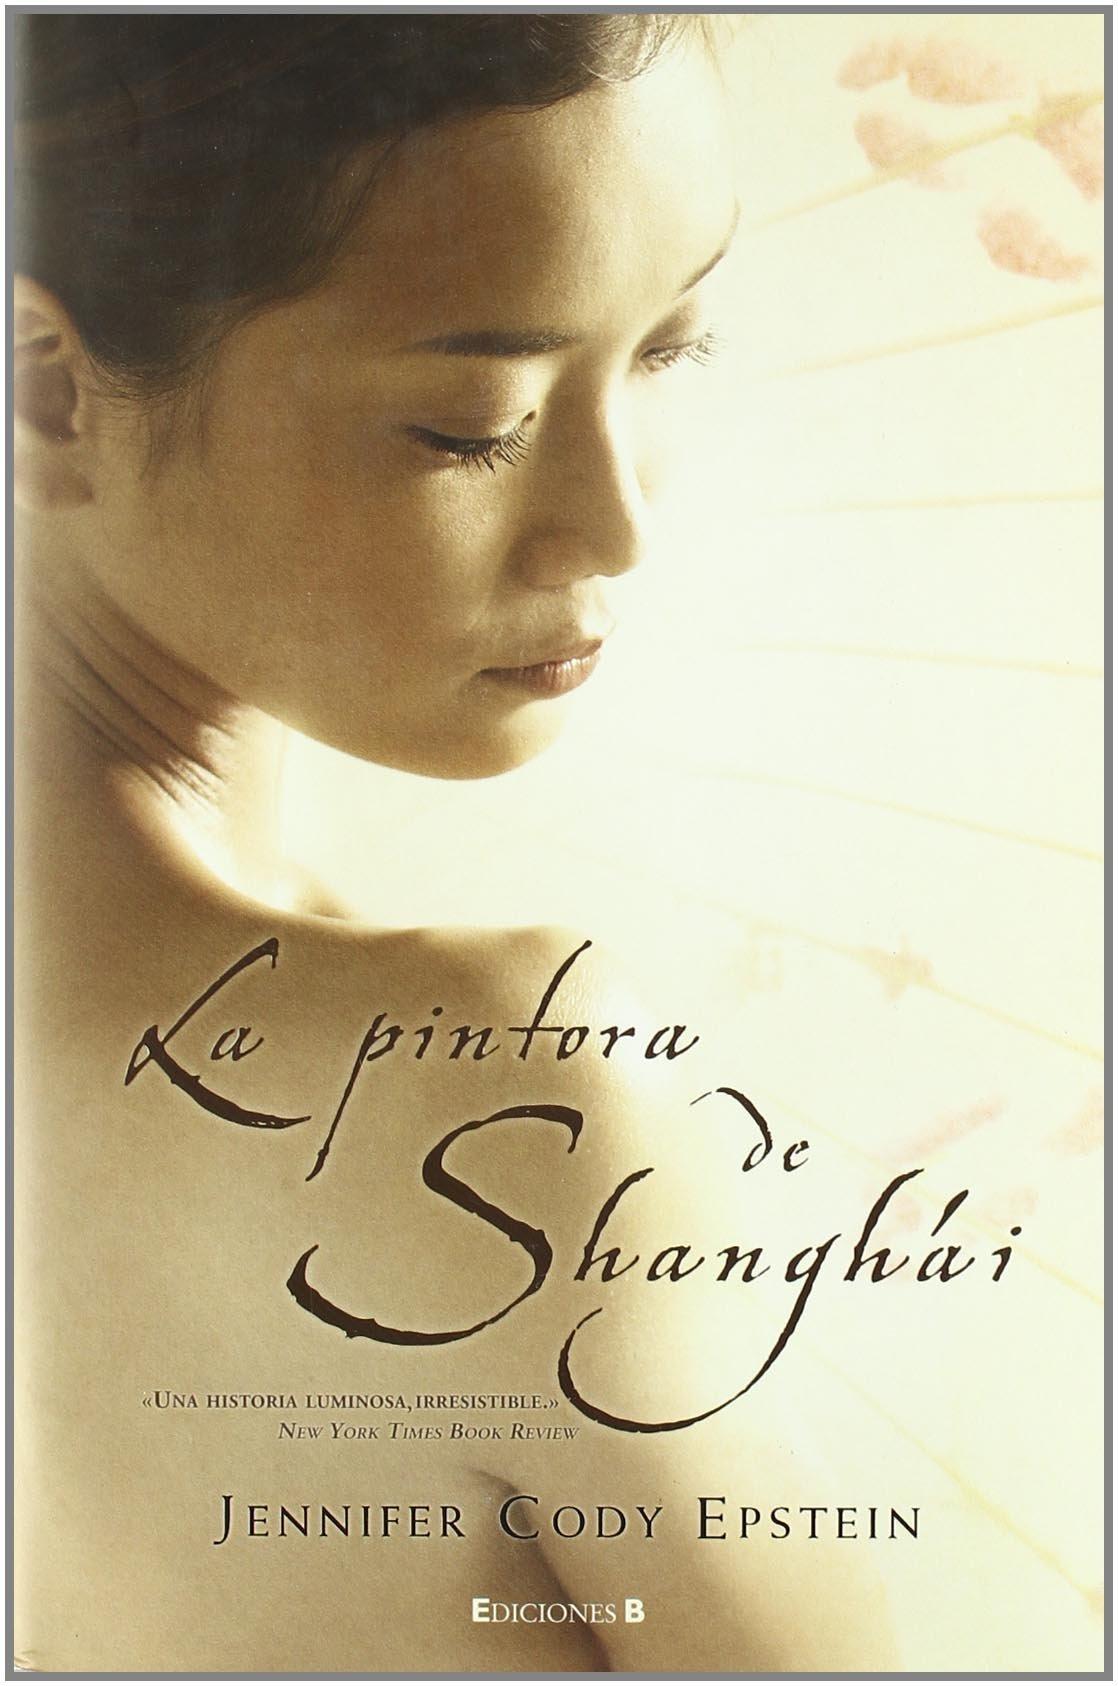 LA PINTORA DE SHANGAI (GRANDES NOVELAS) Tapa dura – 15 oct 2008 Jennifer Epstein JUAN SOLER CHIC EDB FICCION 8466615598